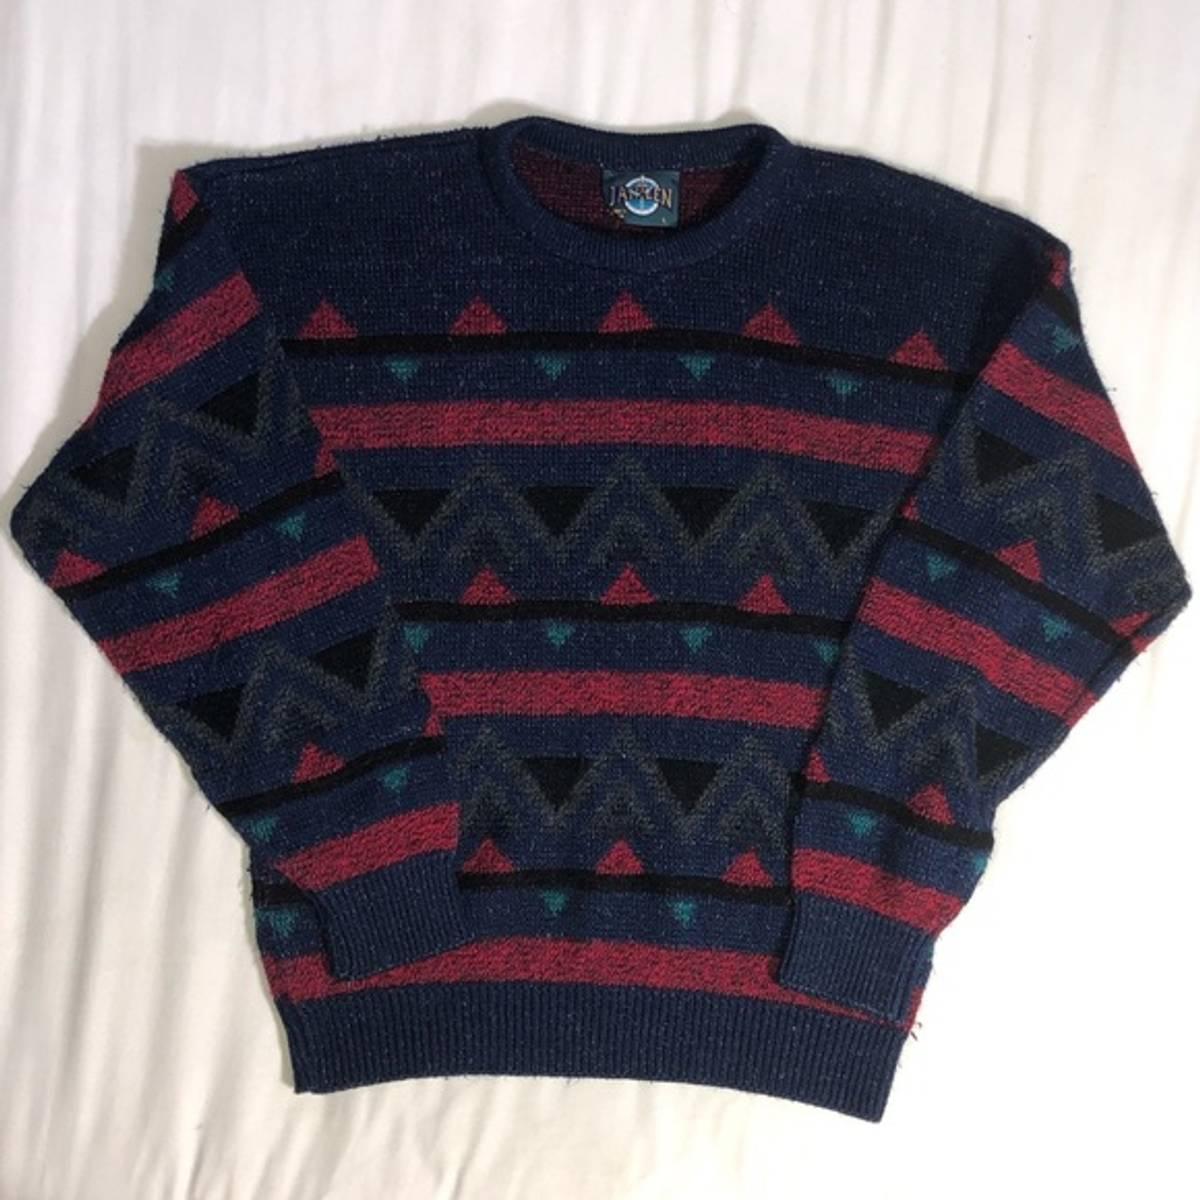 Vintage Big Guys Sweater Mens Pullover Jantzen Chevron Pattern Made in USA